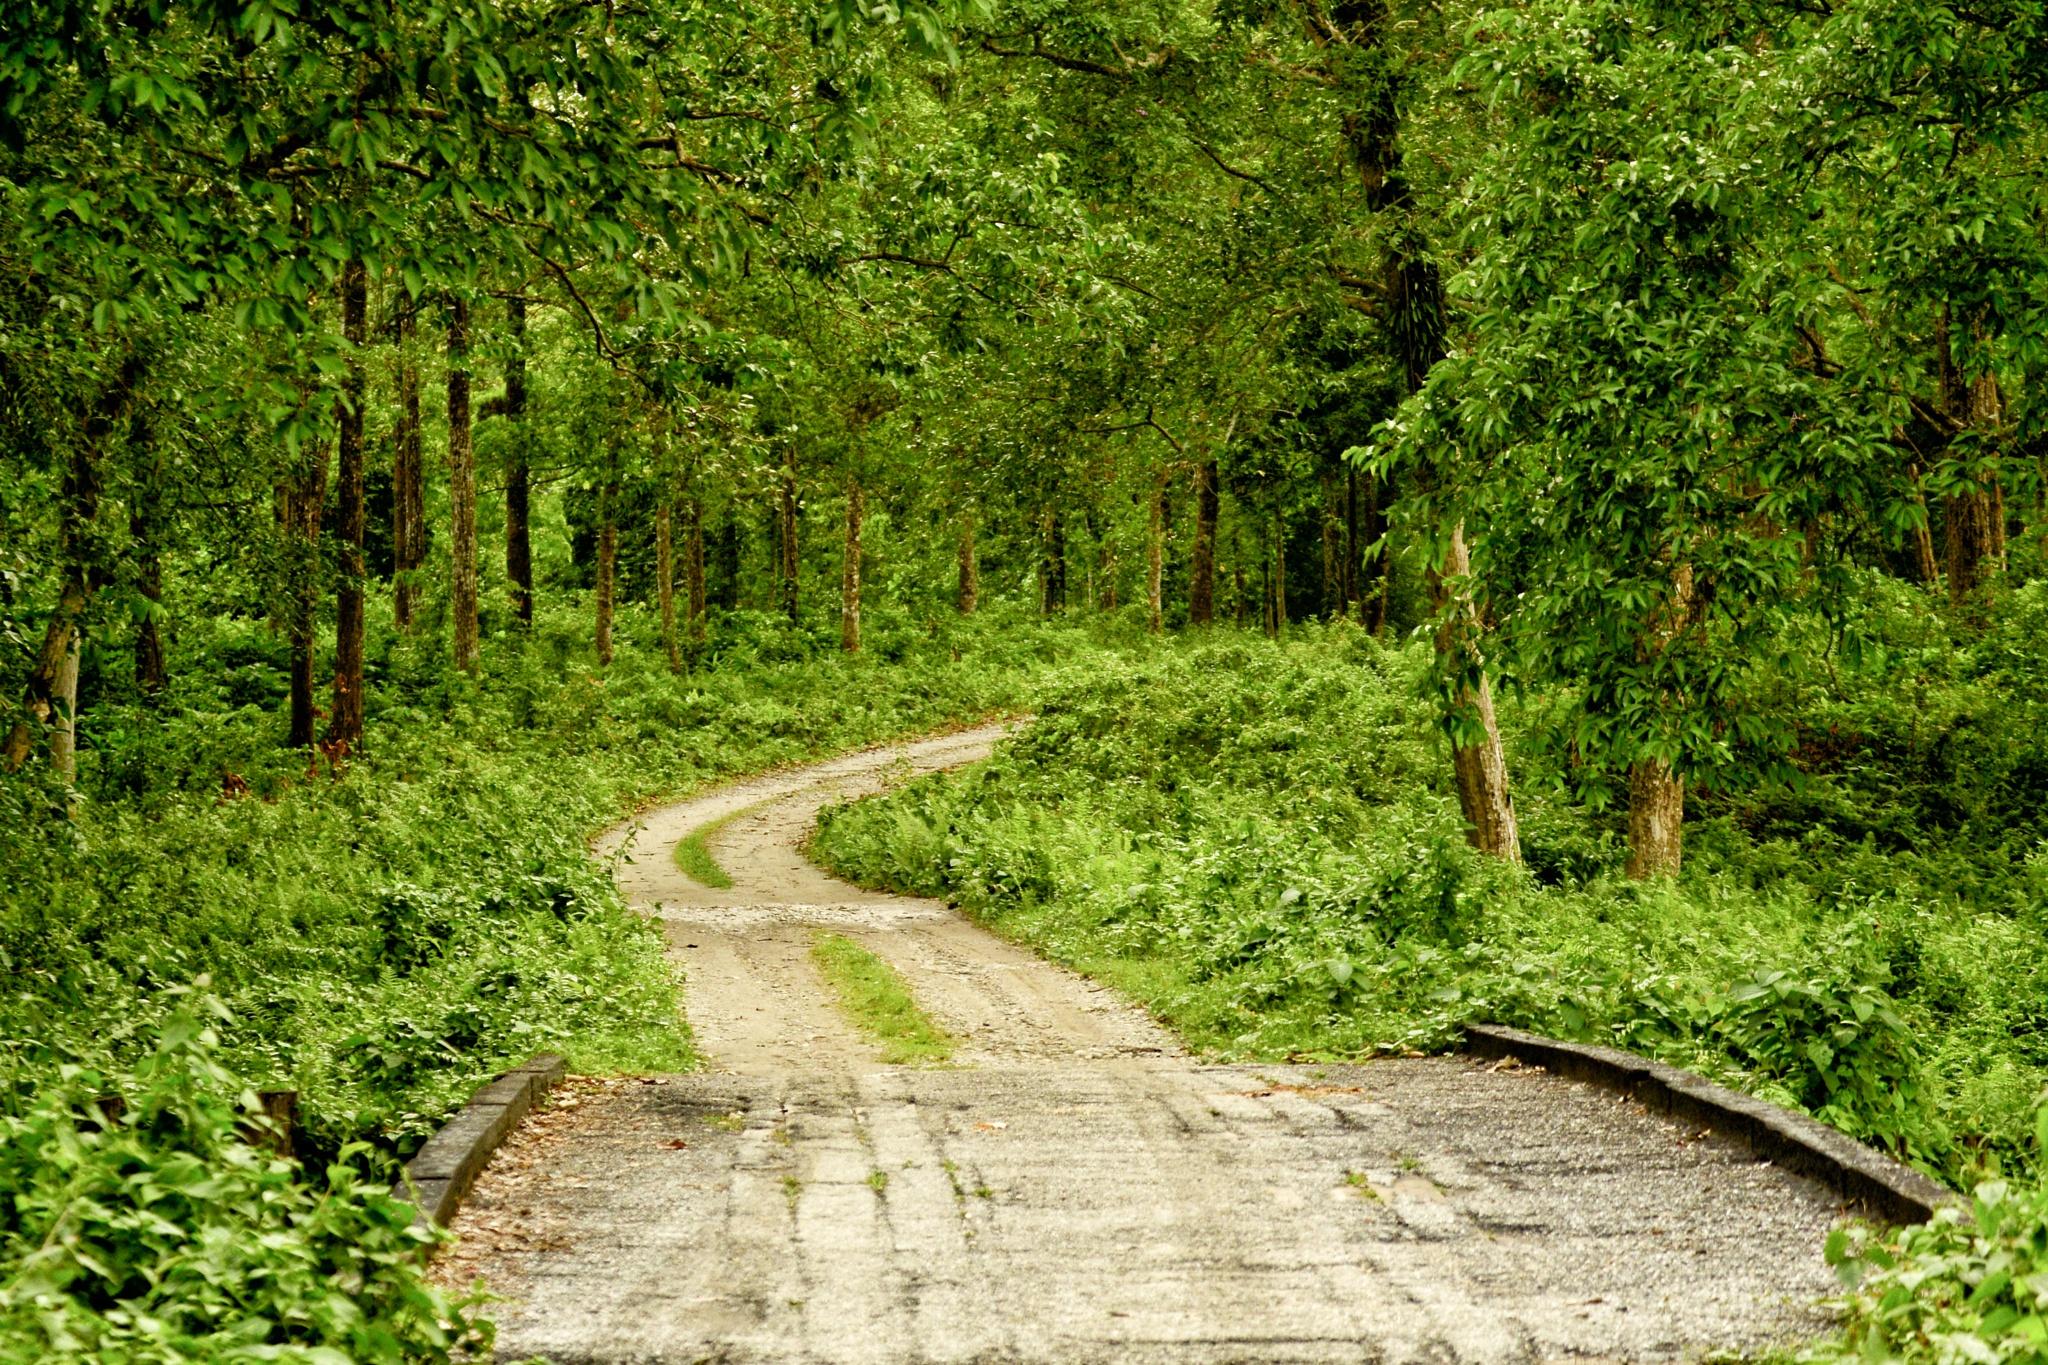 In the Woods by Deepayan Dey